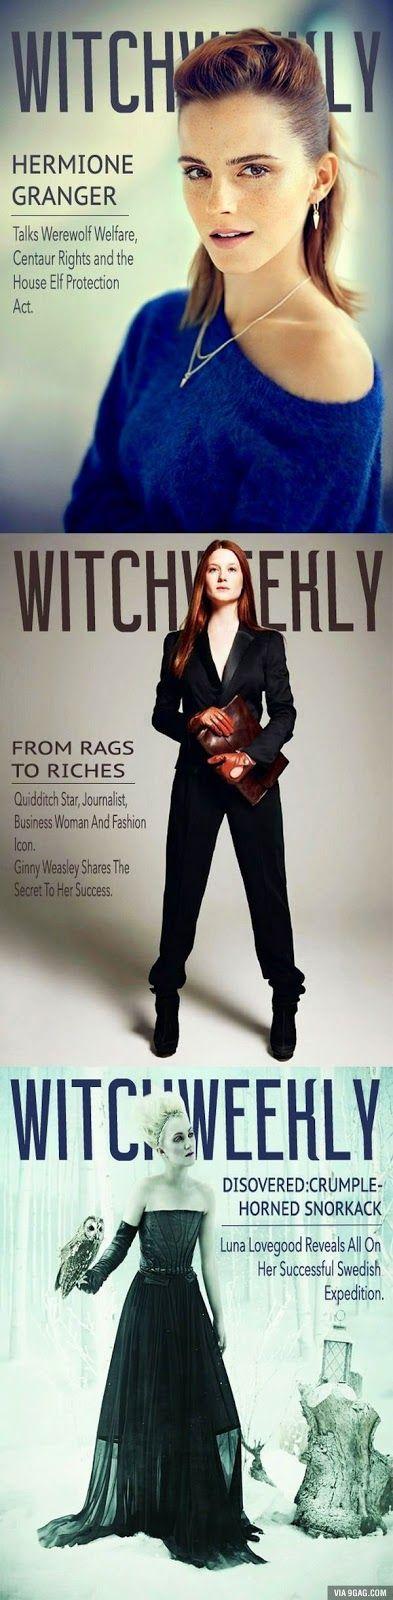 Witch Weekly Series  Hermione Granger Ginny Weasley Luna Lovegood